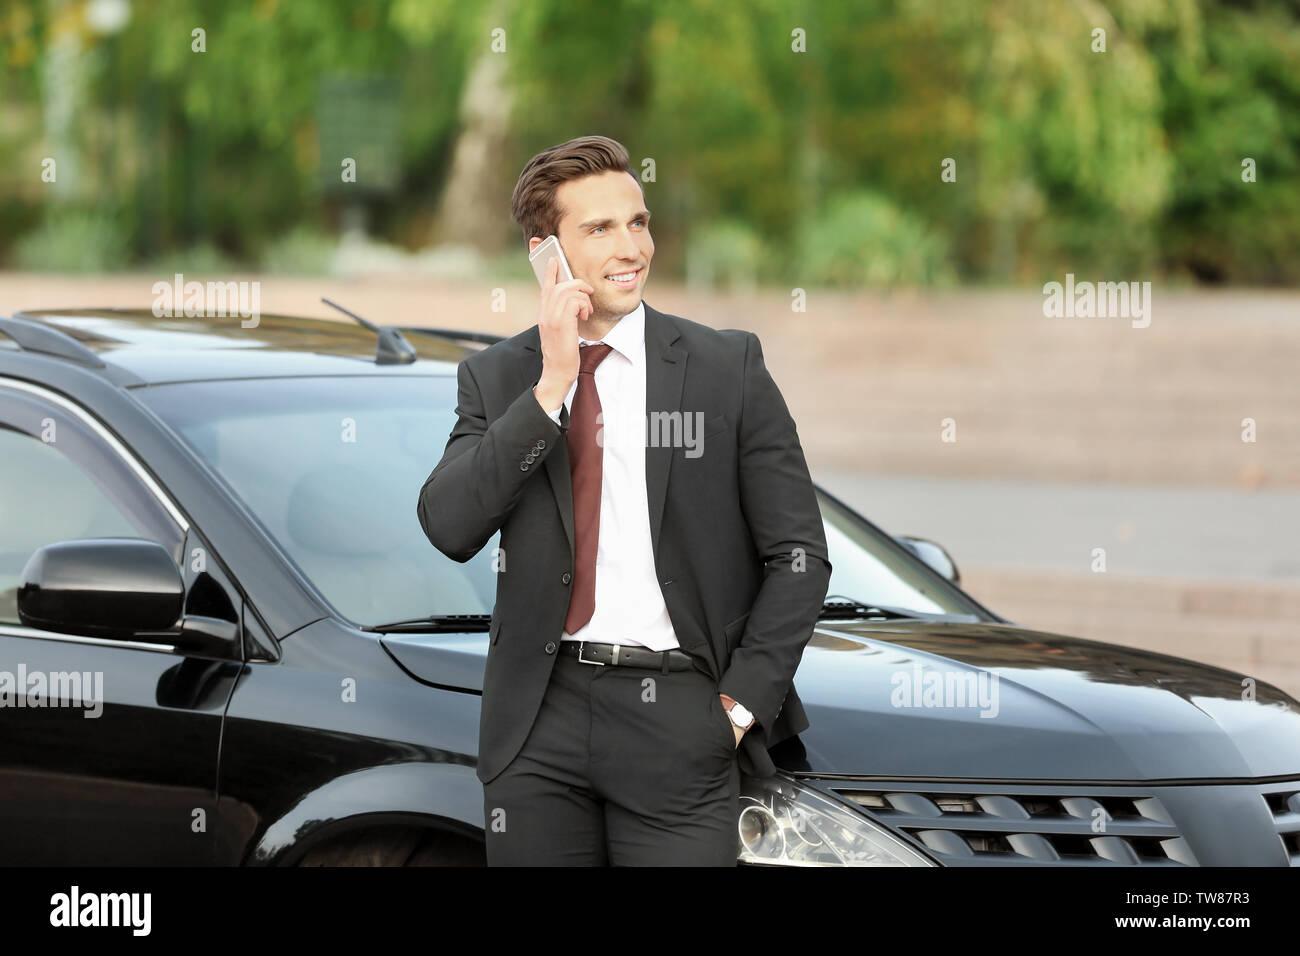 Man in formal wear talking on phone near car outdoors - Stock Image